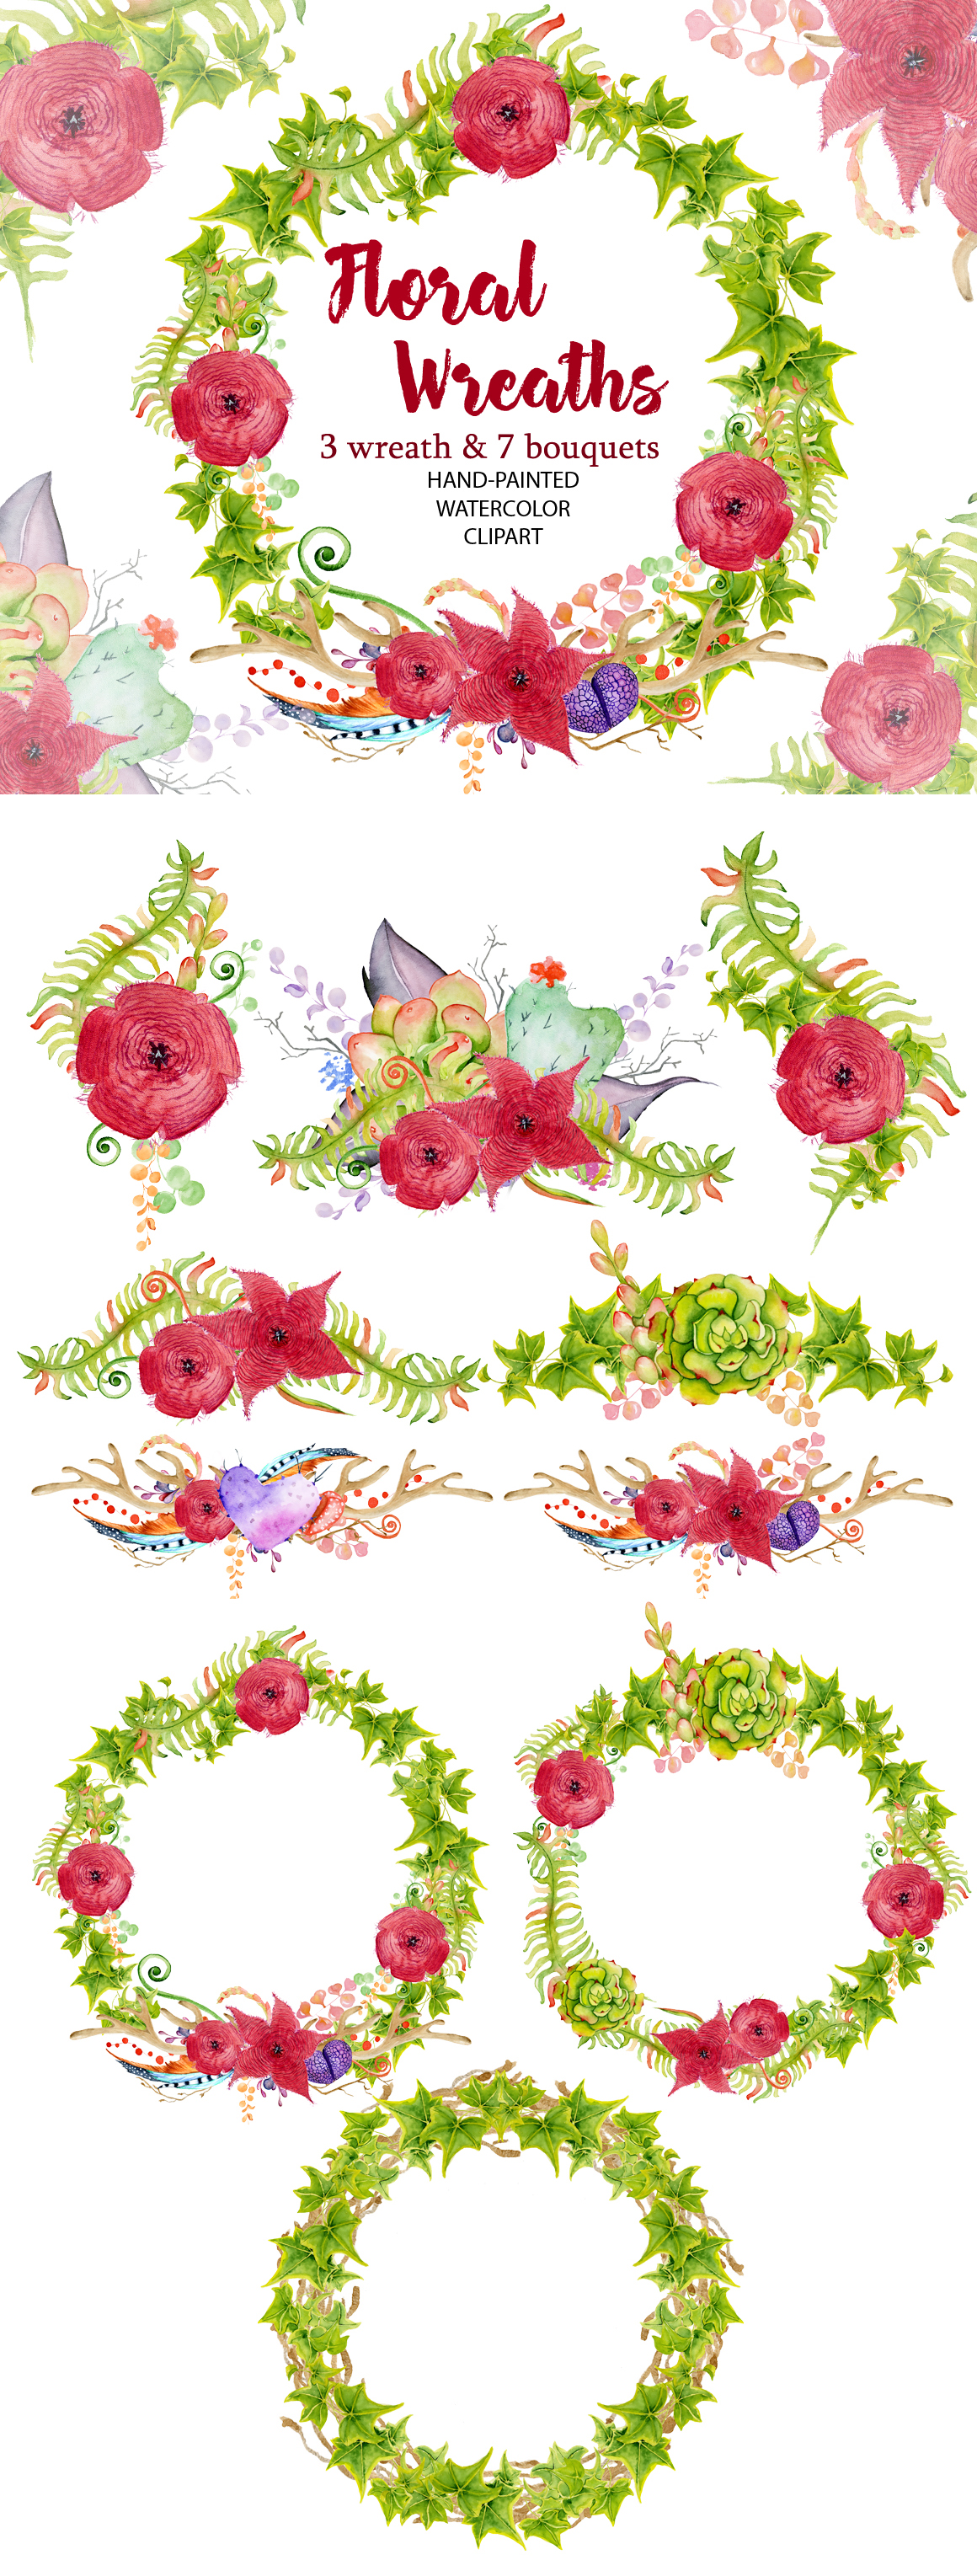 Floral Wreath clipart